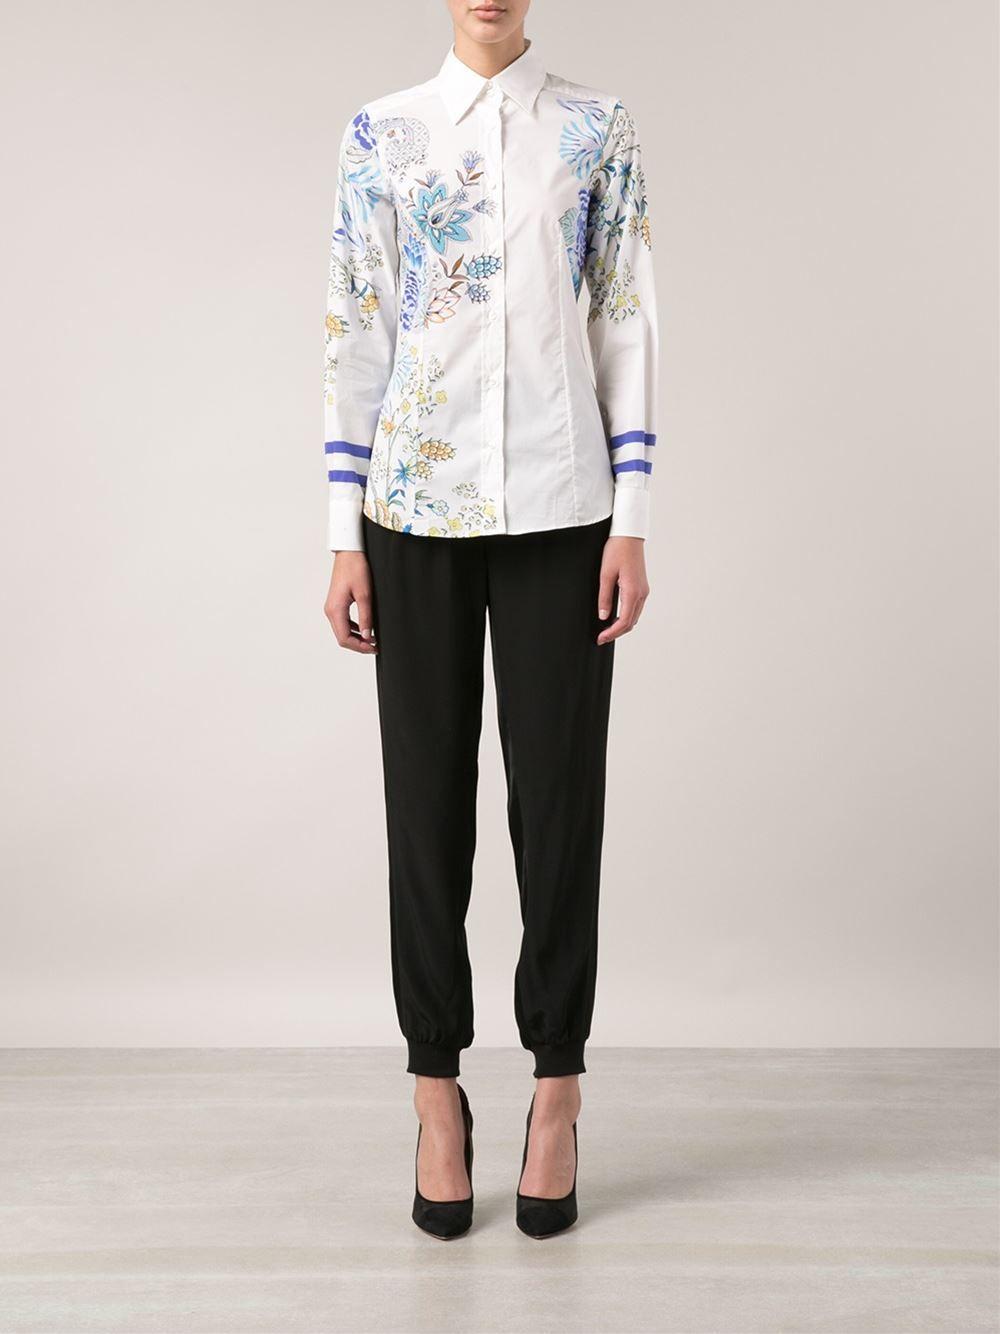 Etro Flower Print Shirt - Biedermann En Vogue - Farfetch.com